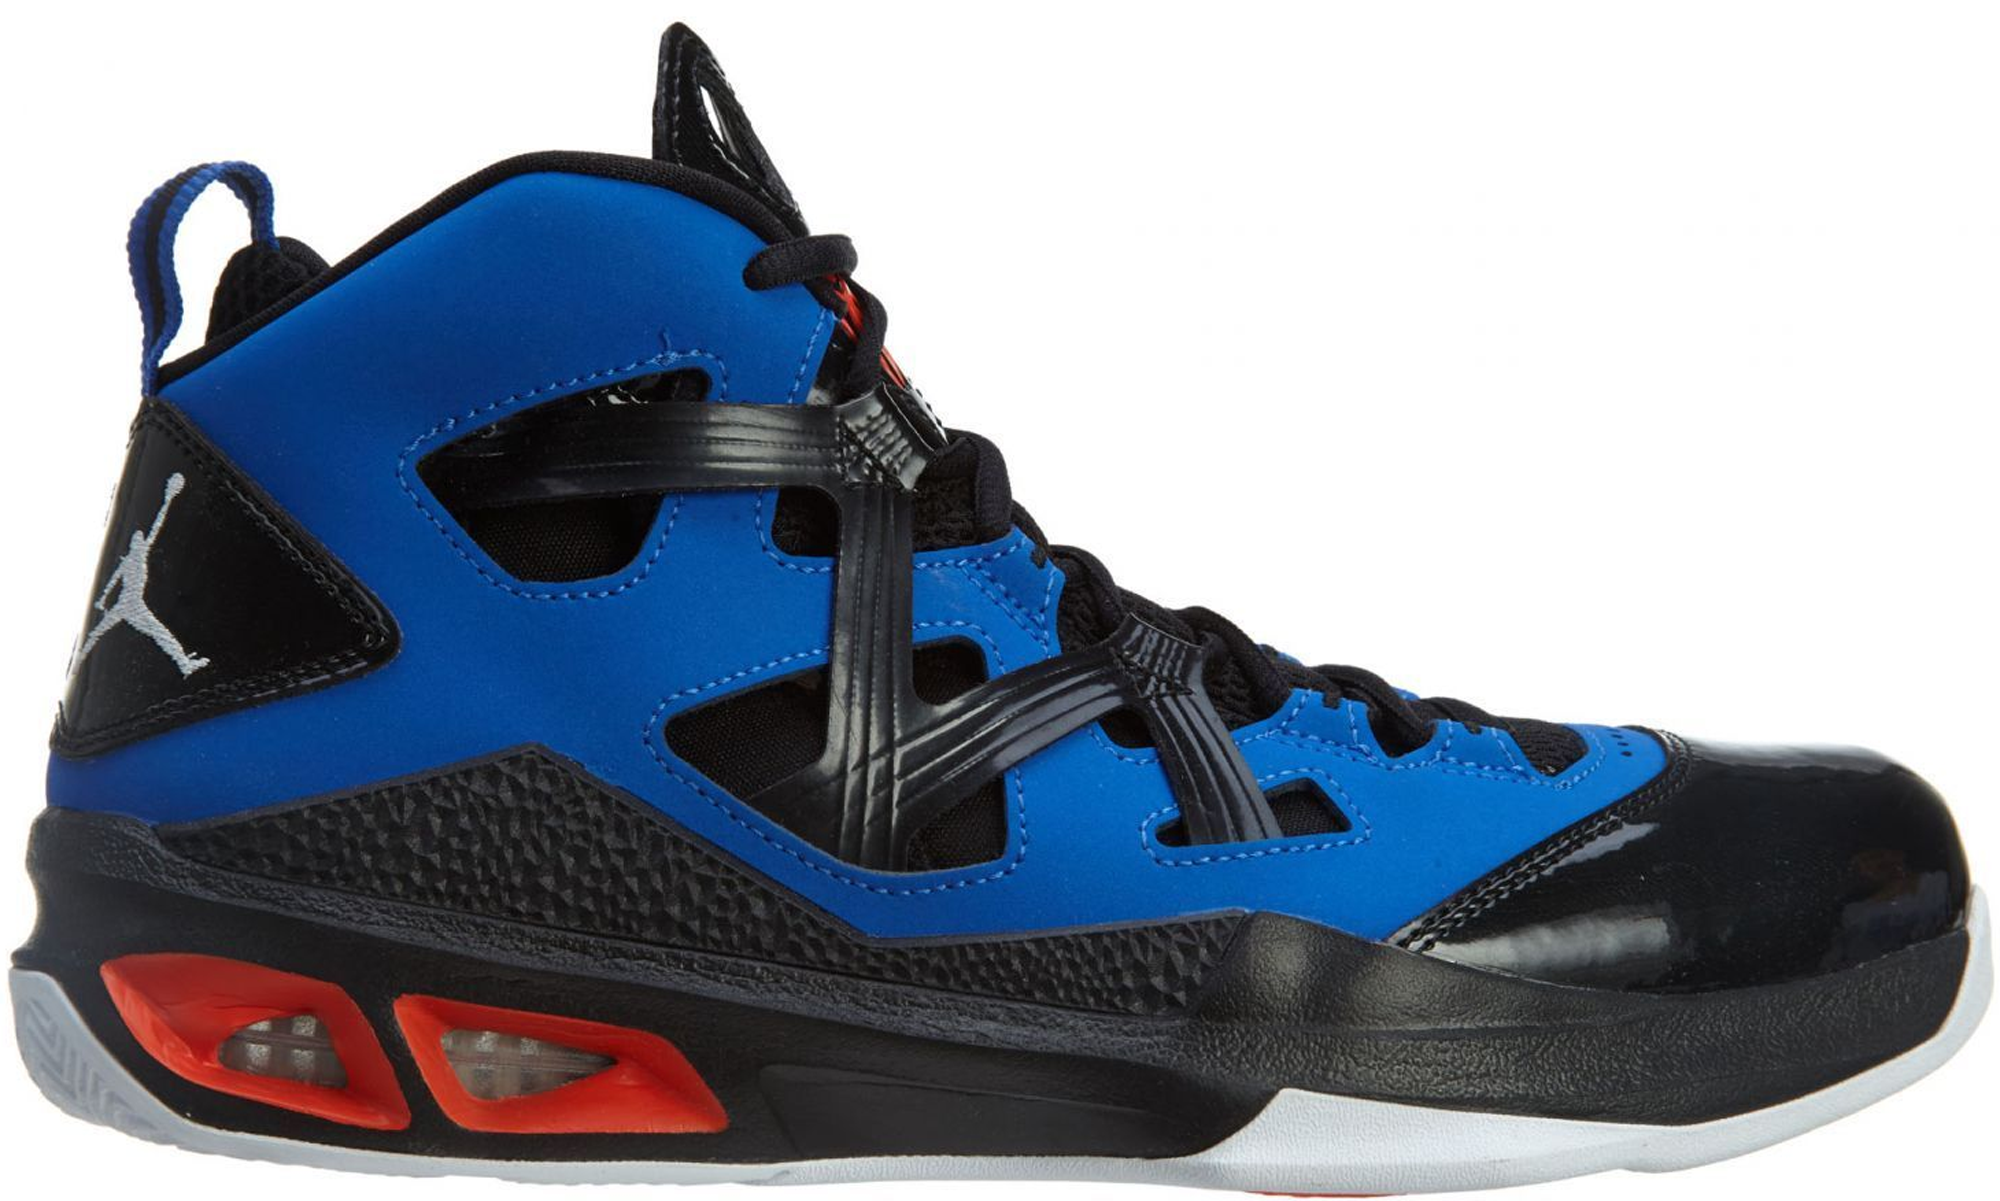 Jordan Melo M9 Knicks Away - 551879-407